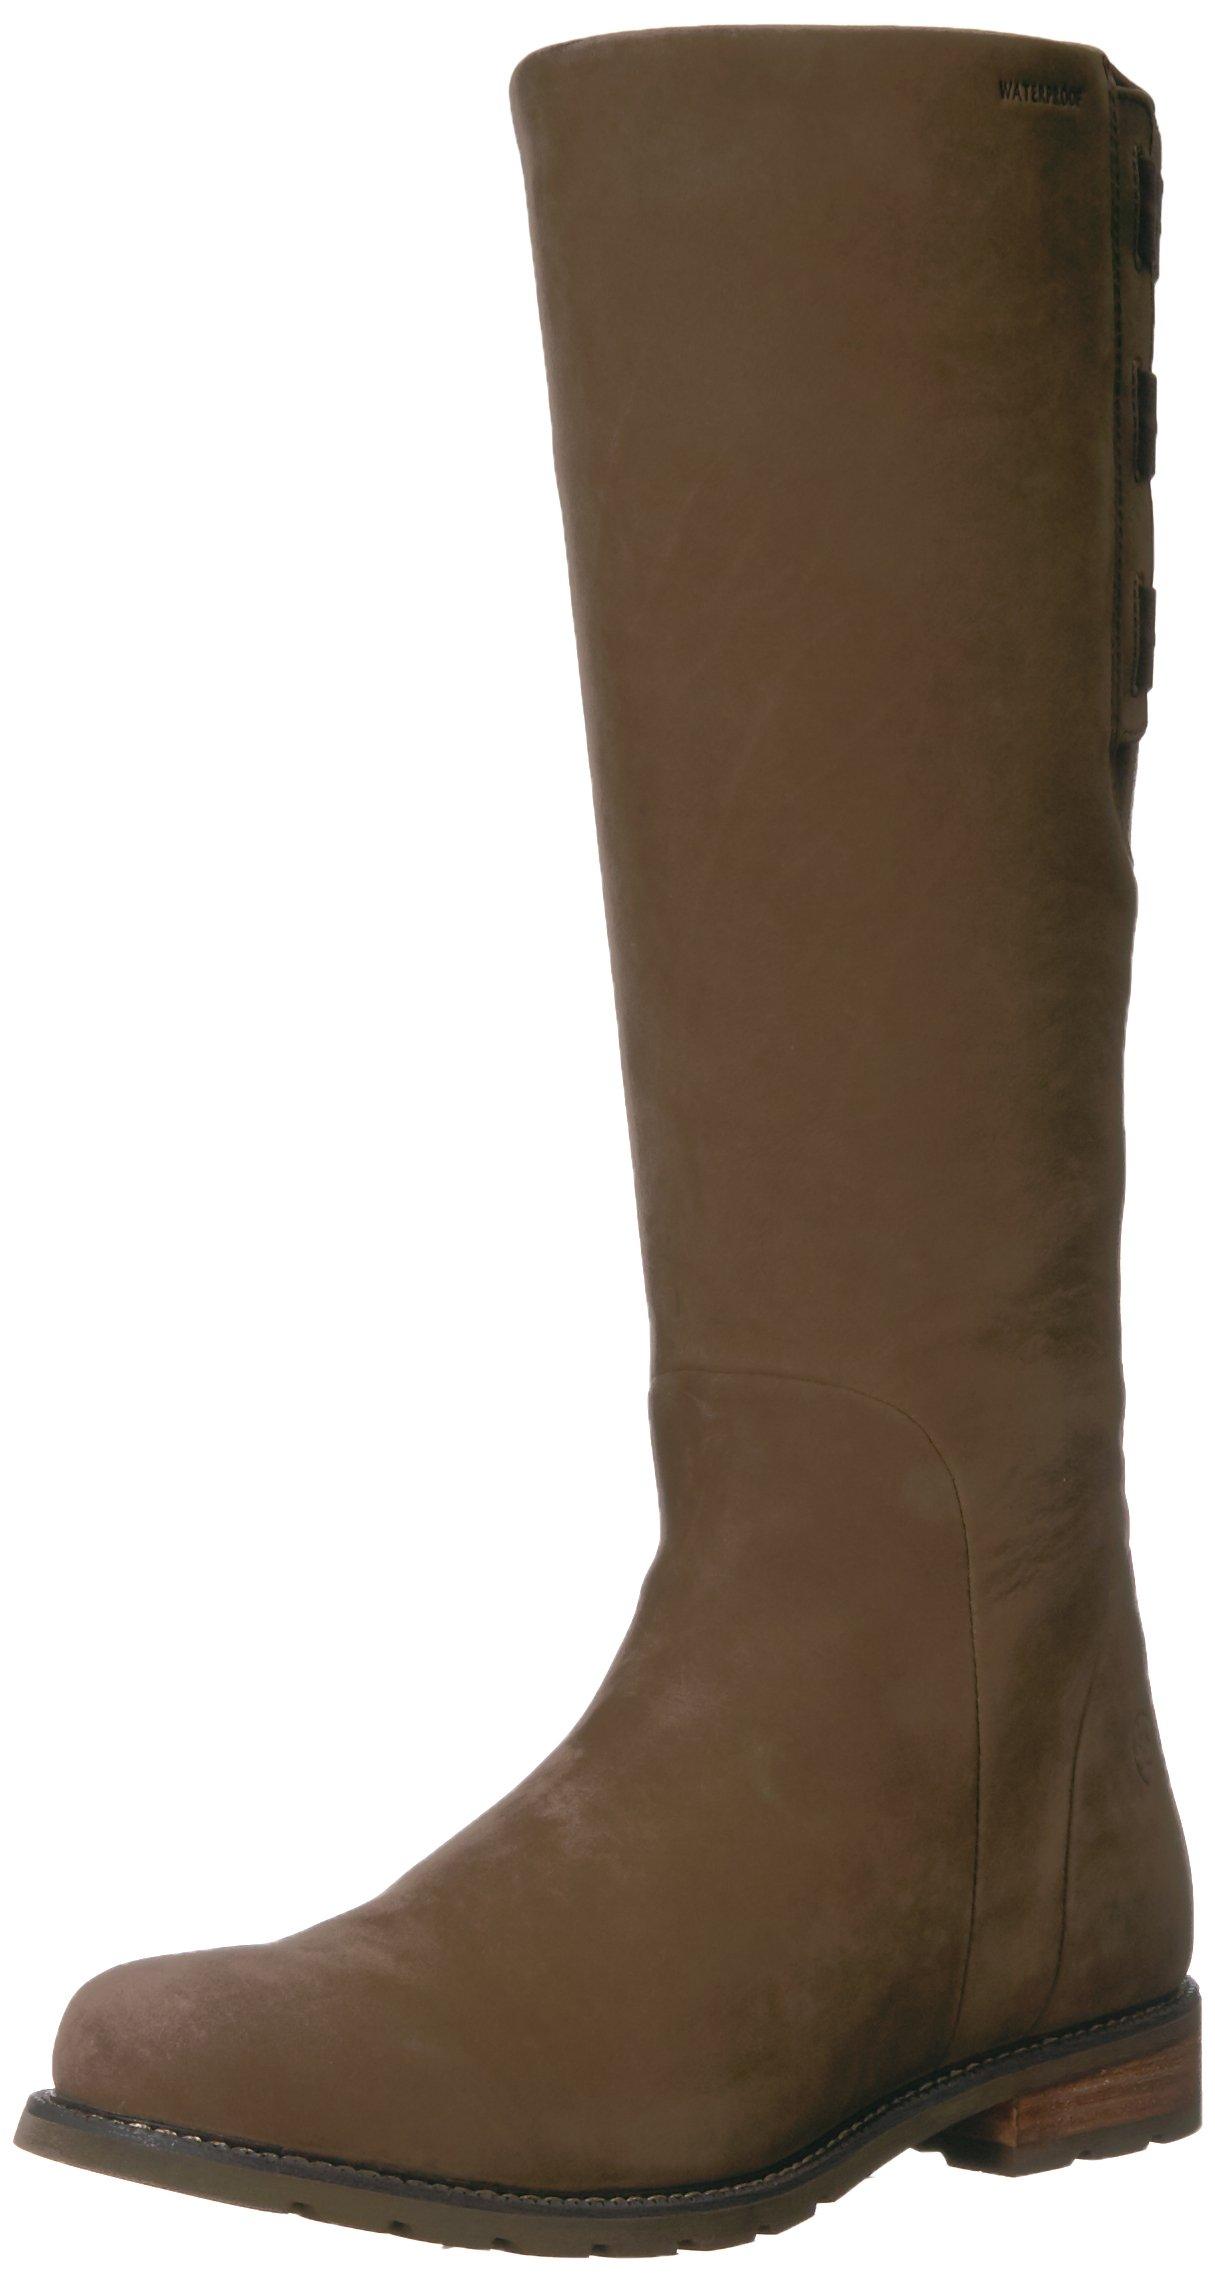 Ariat Women's Clara H2O Work Boot, Fawn, 11 B US